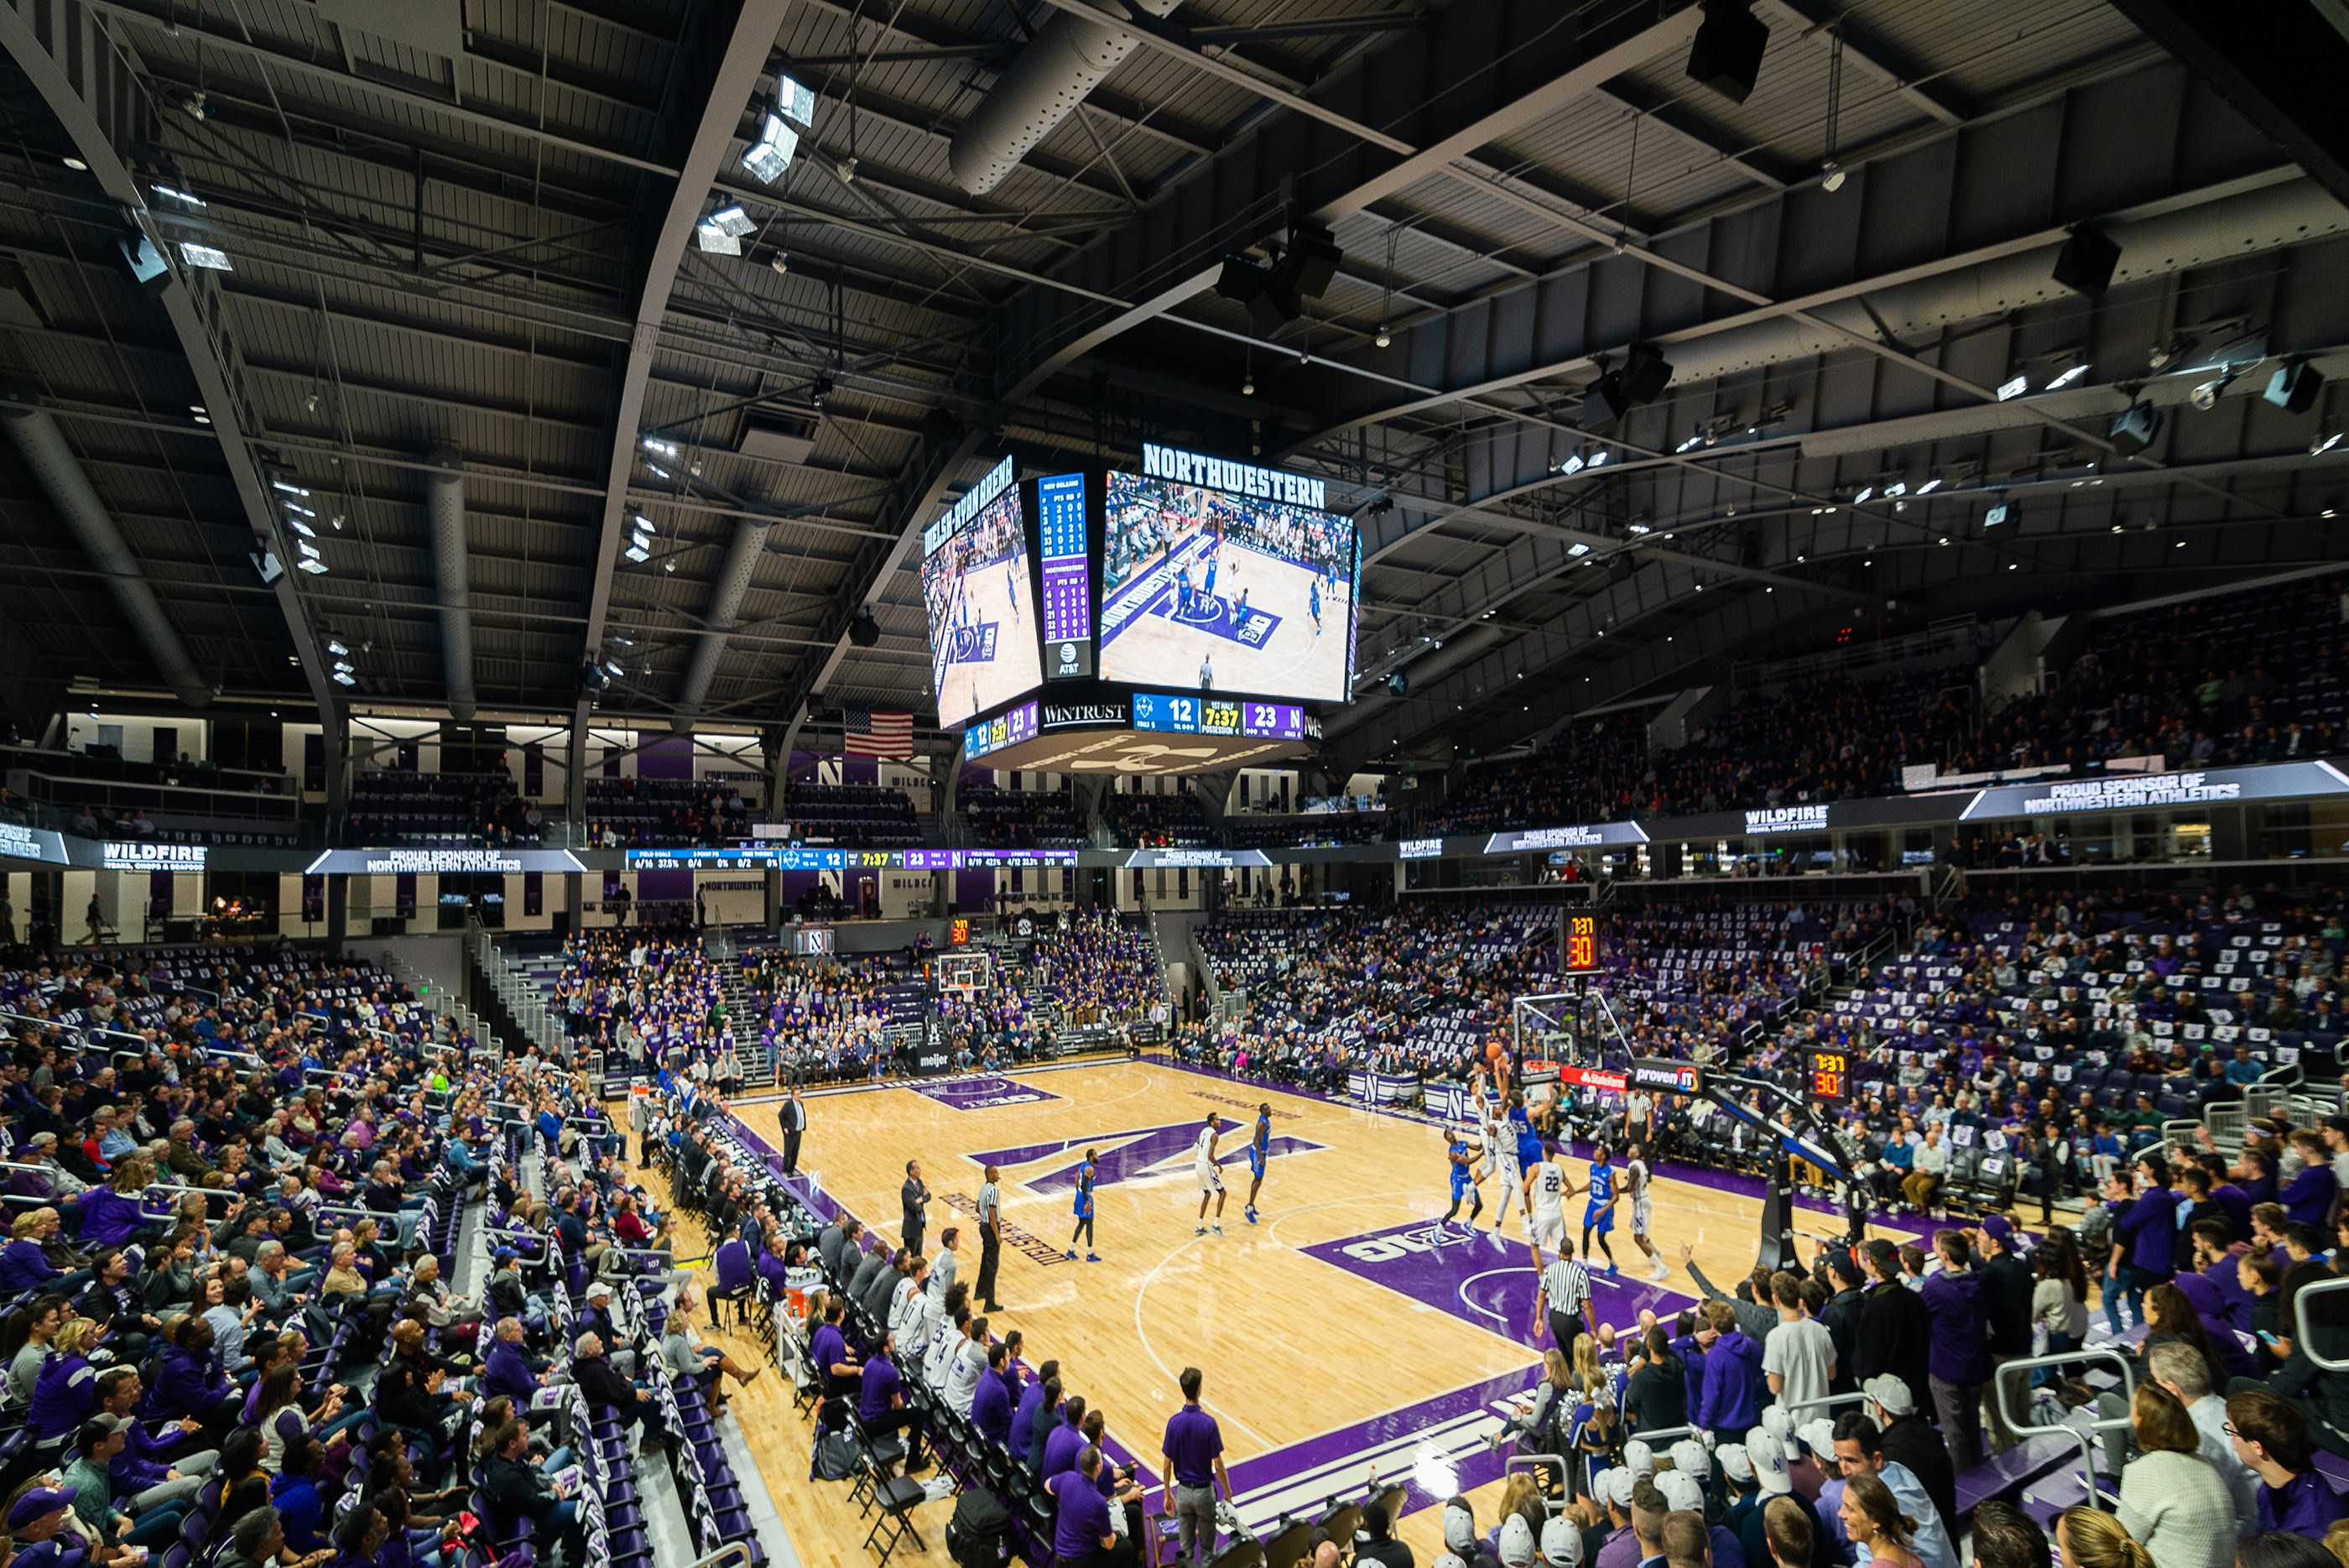 Northwestern University Welsh Ryan Arena On Behance Northwestern University Northwestern Arena